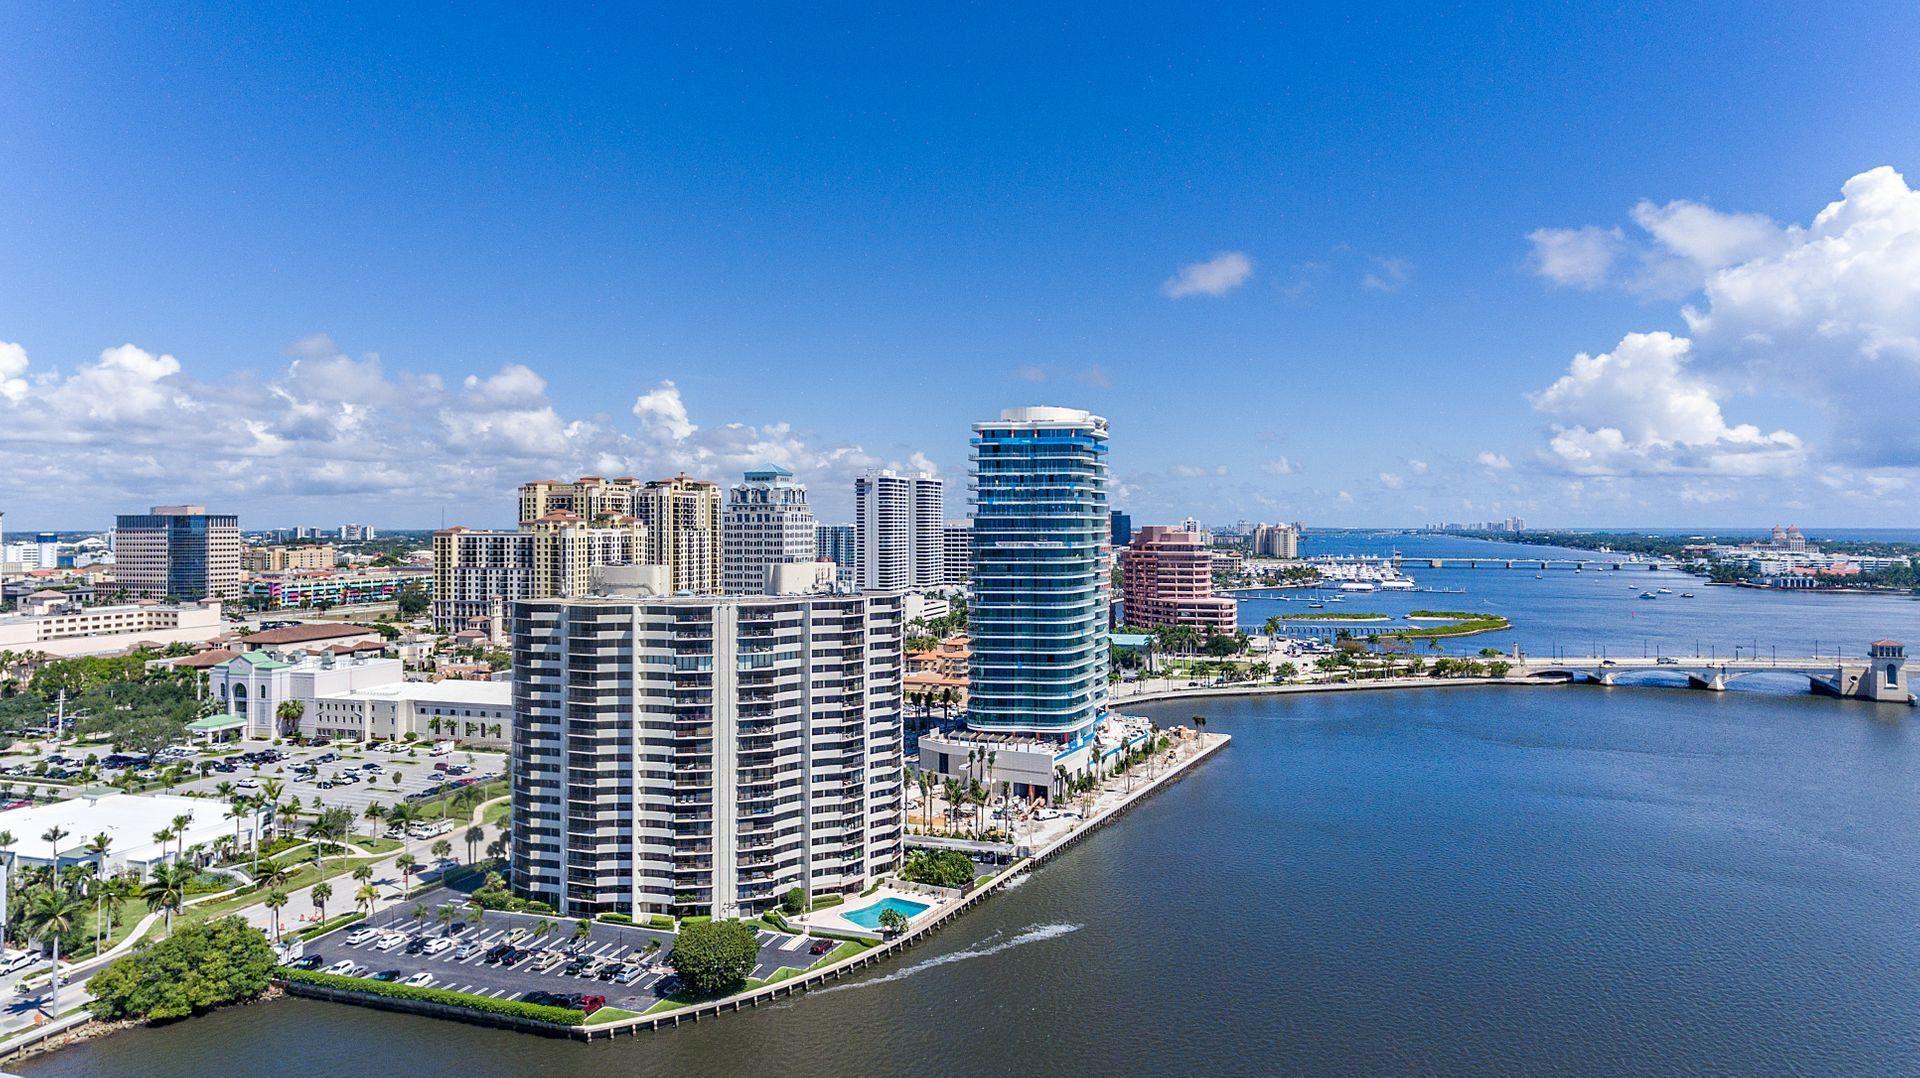 1200 S Flagler #902, West Palm Beach, FL 33401 - MLS#: RX-10722471